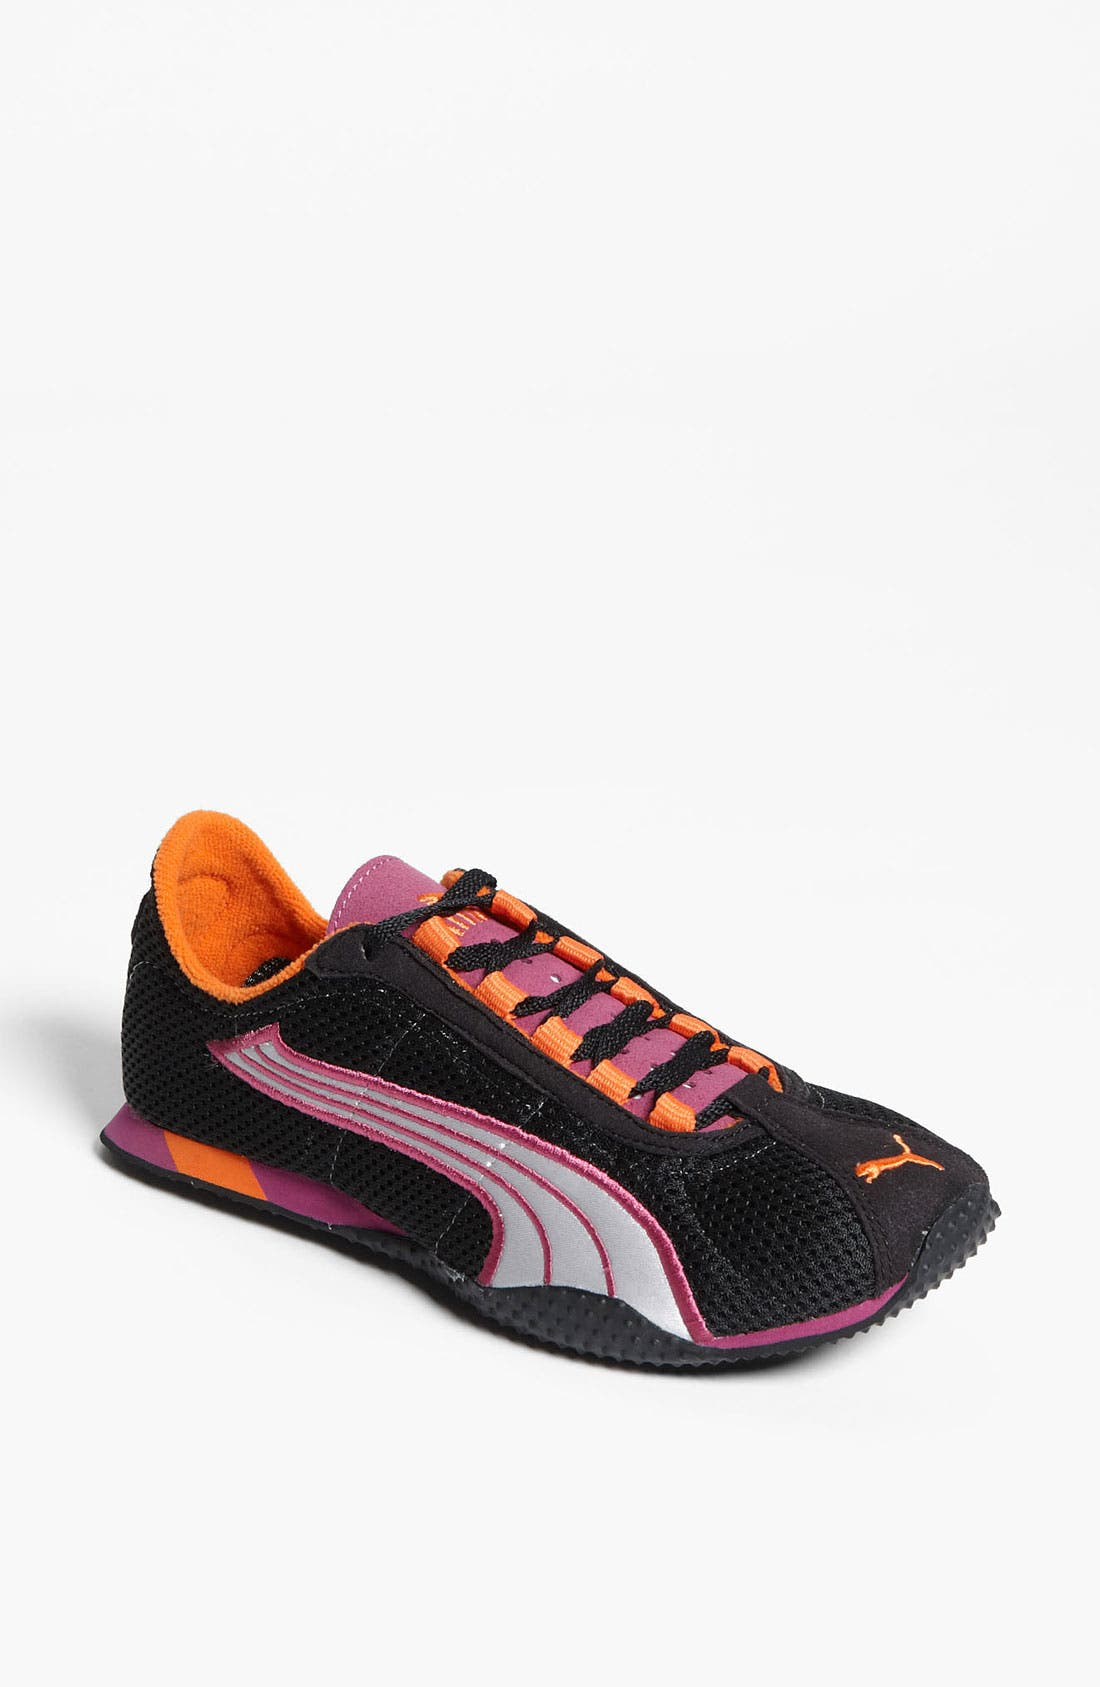 Alternate Image 1 Selected - PUMA 'H Street' Sneaker (Women)